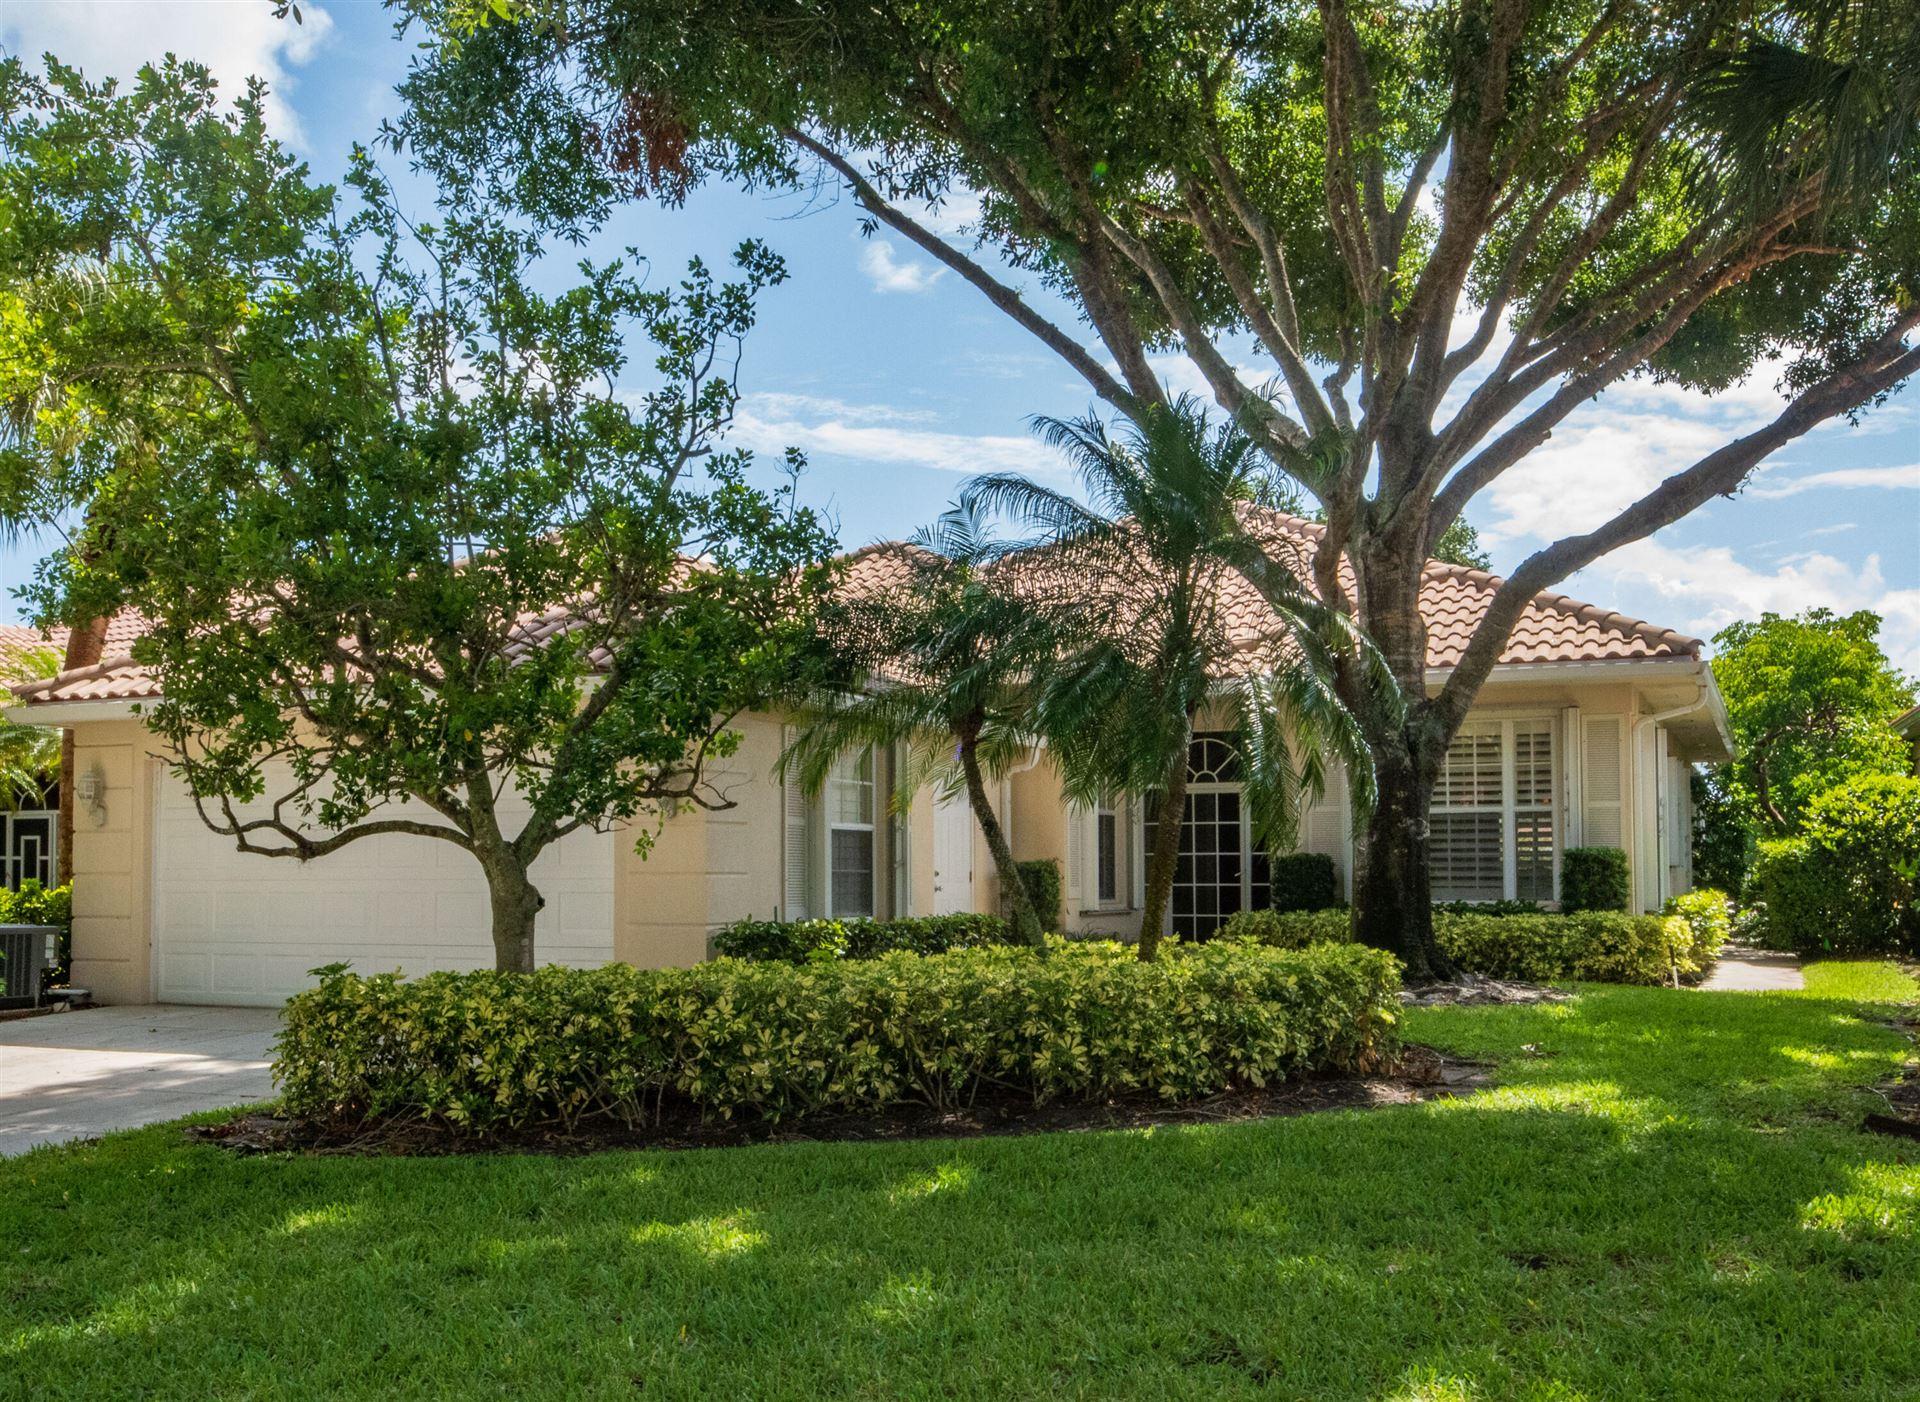 438 Kelsey Park Drive, Palm Beach Gardens, FL 33410 - MLS#: RX-10722284